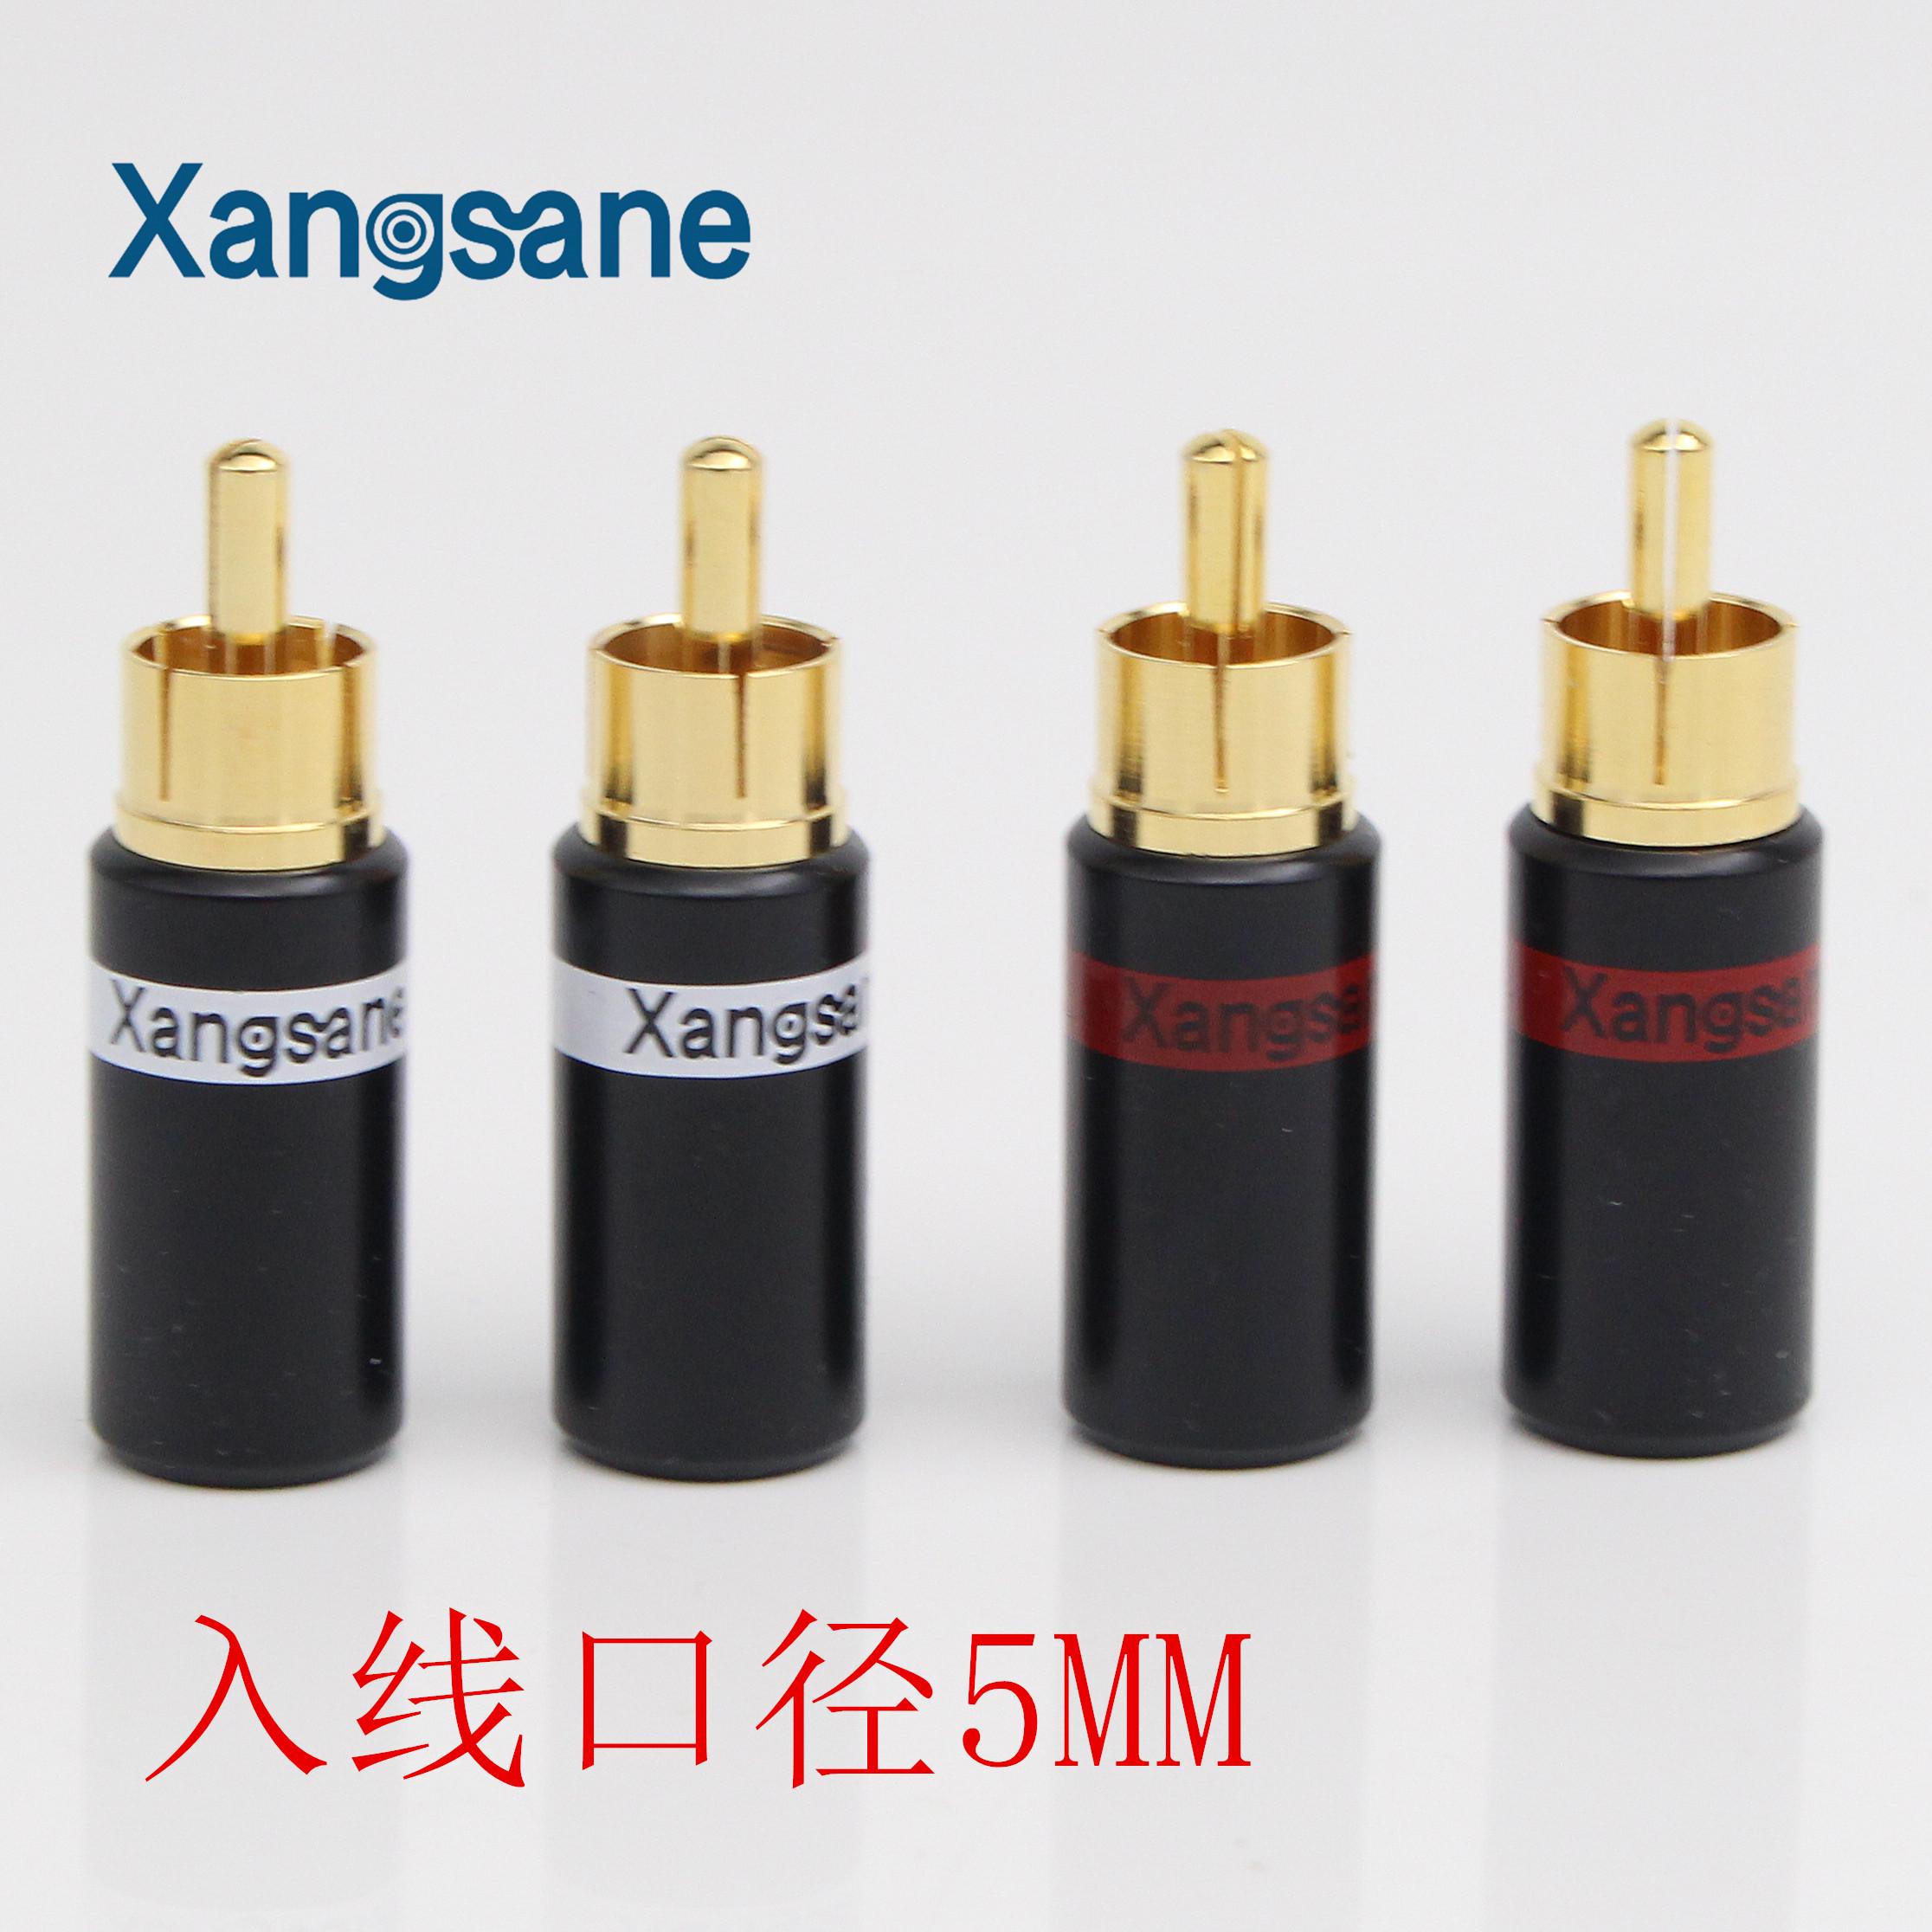 Xangsane так бог RCA сварка штекер лотос глава звук видео цвет терминал AV звуковая частота глава